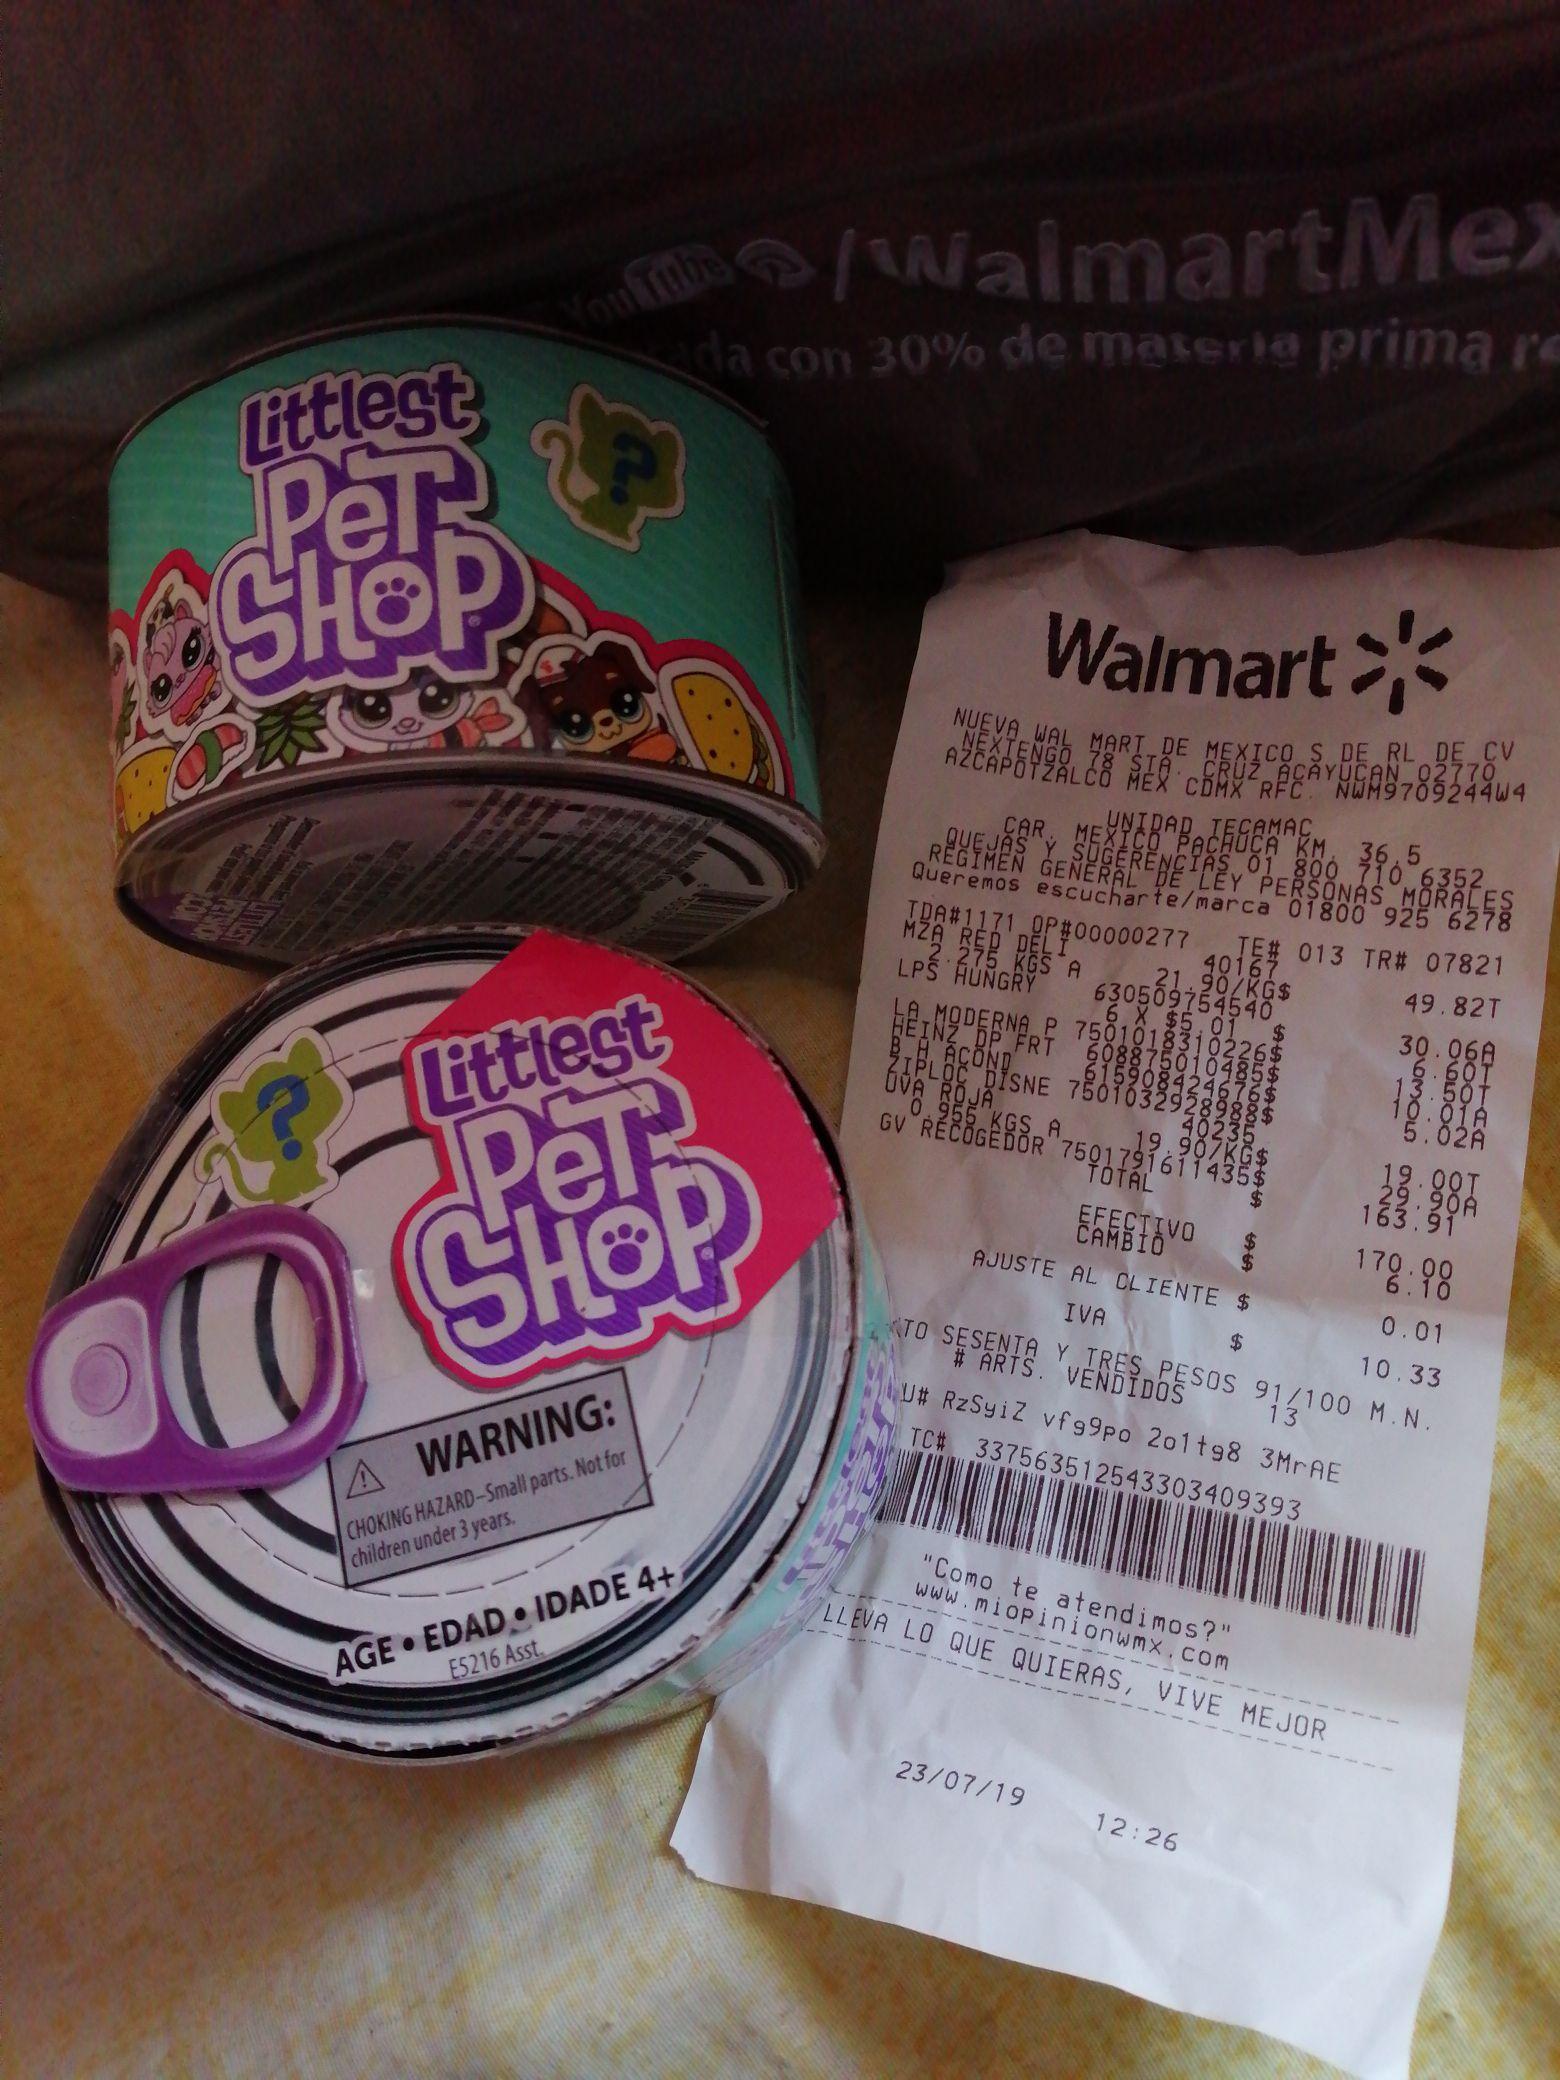 Walmart Tecamac: Little Pet shop